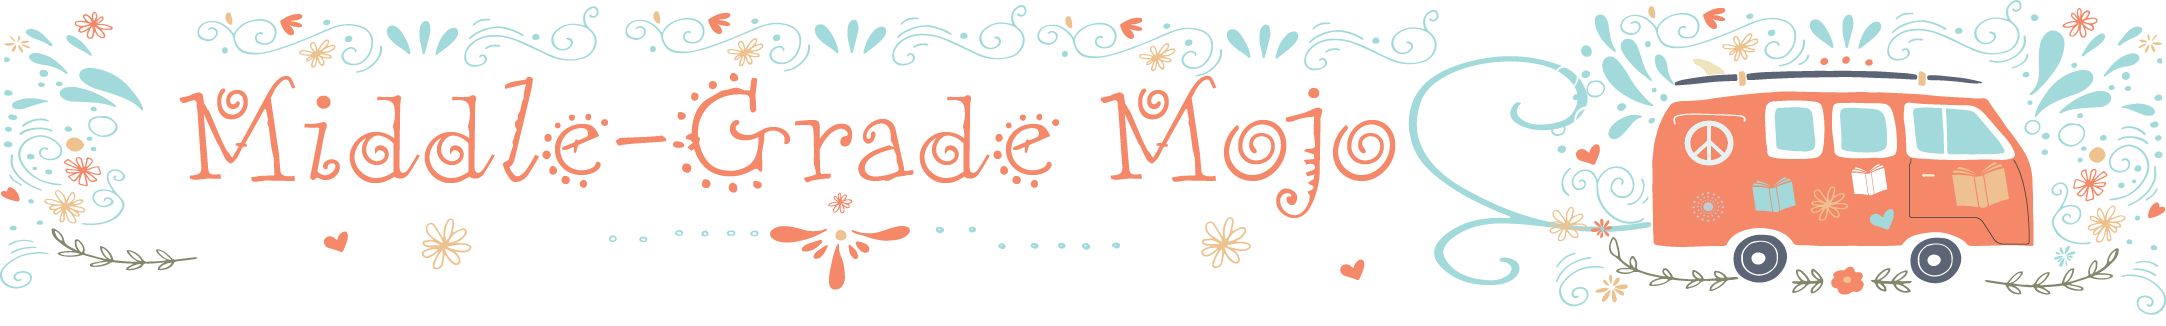 MIDDLE-GRADE MOJO Logo